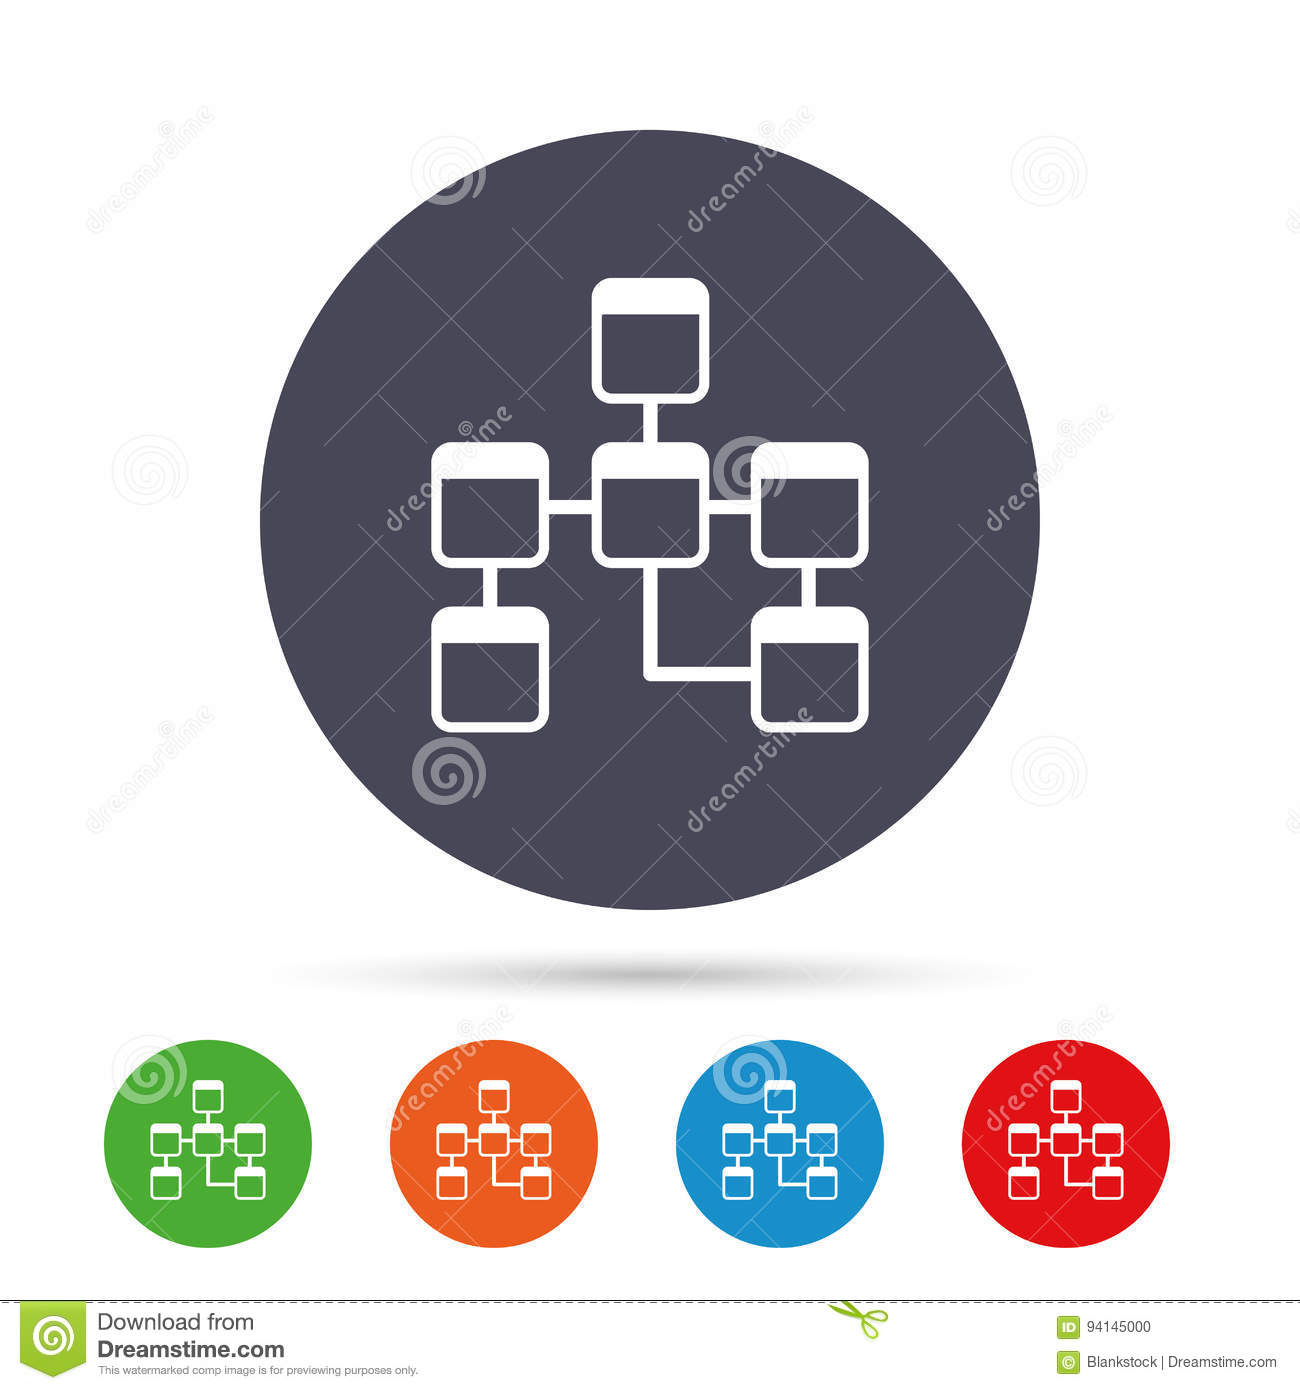 Database Sign Icon. Relational Database Schema. Stock Vector regarding Relational Database Symbols